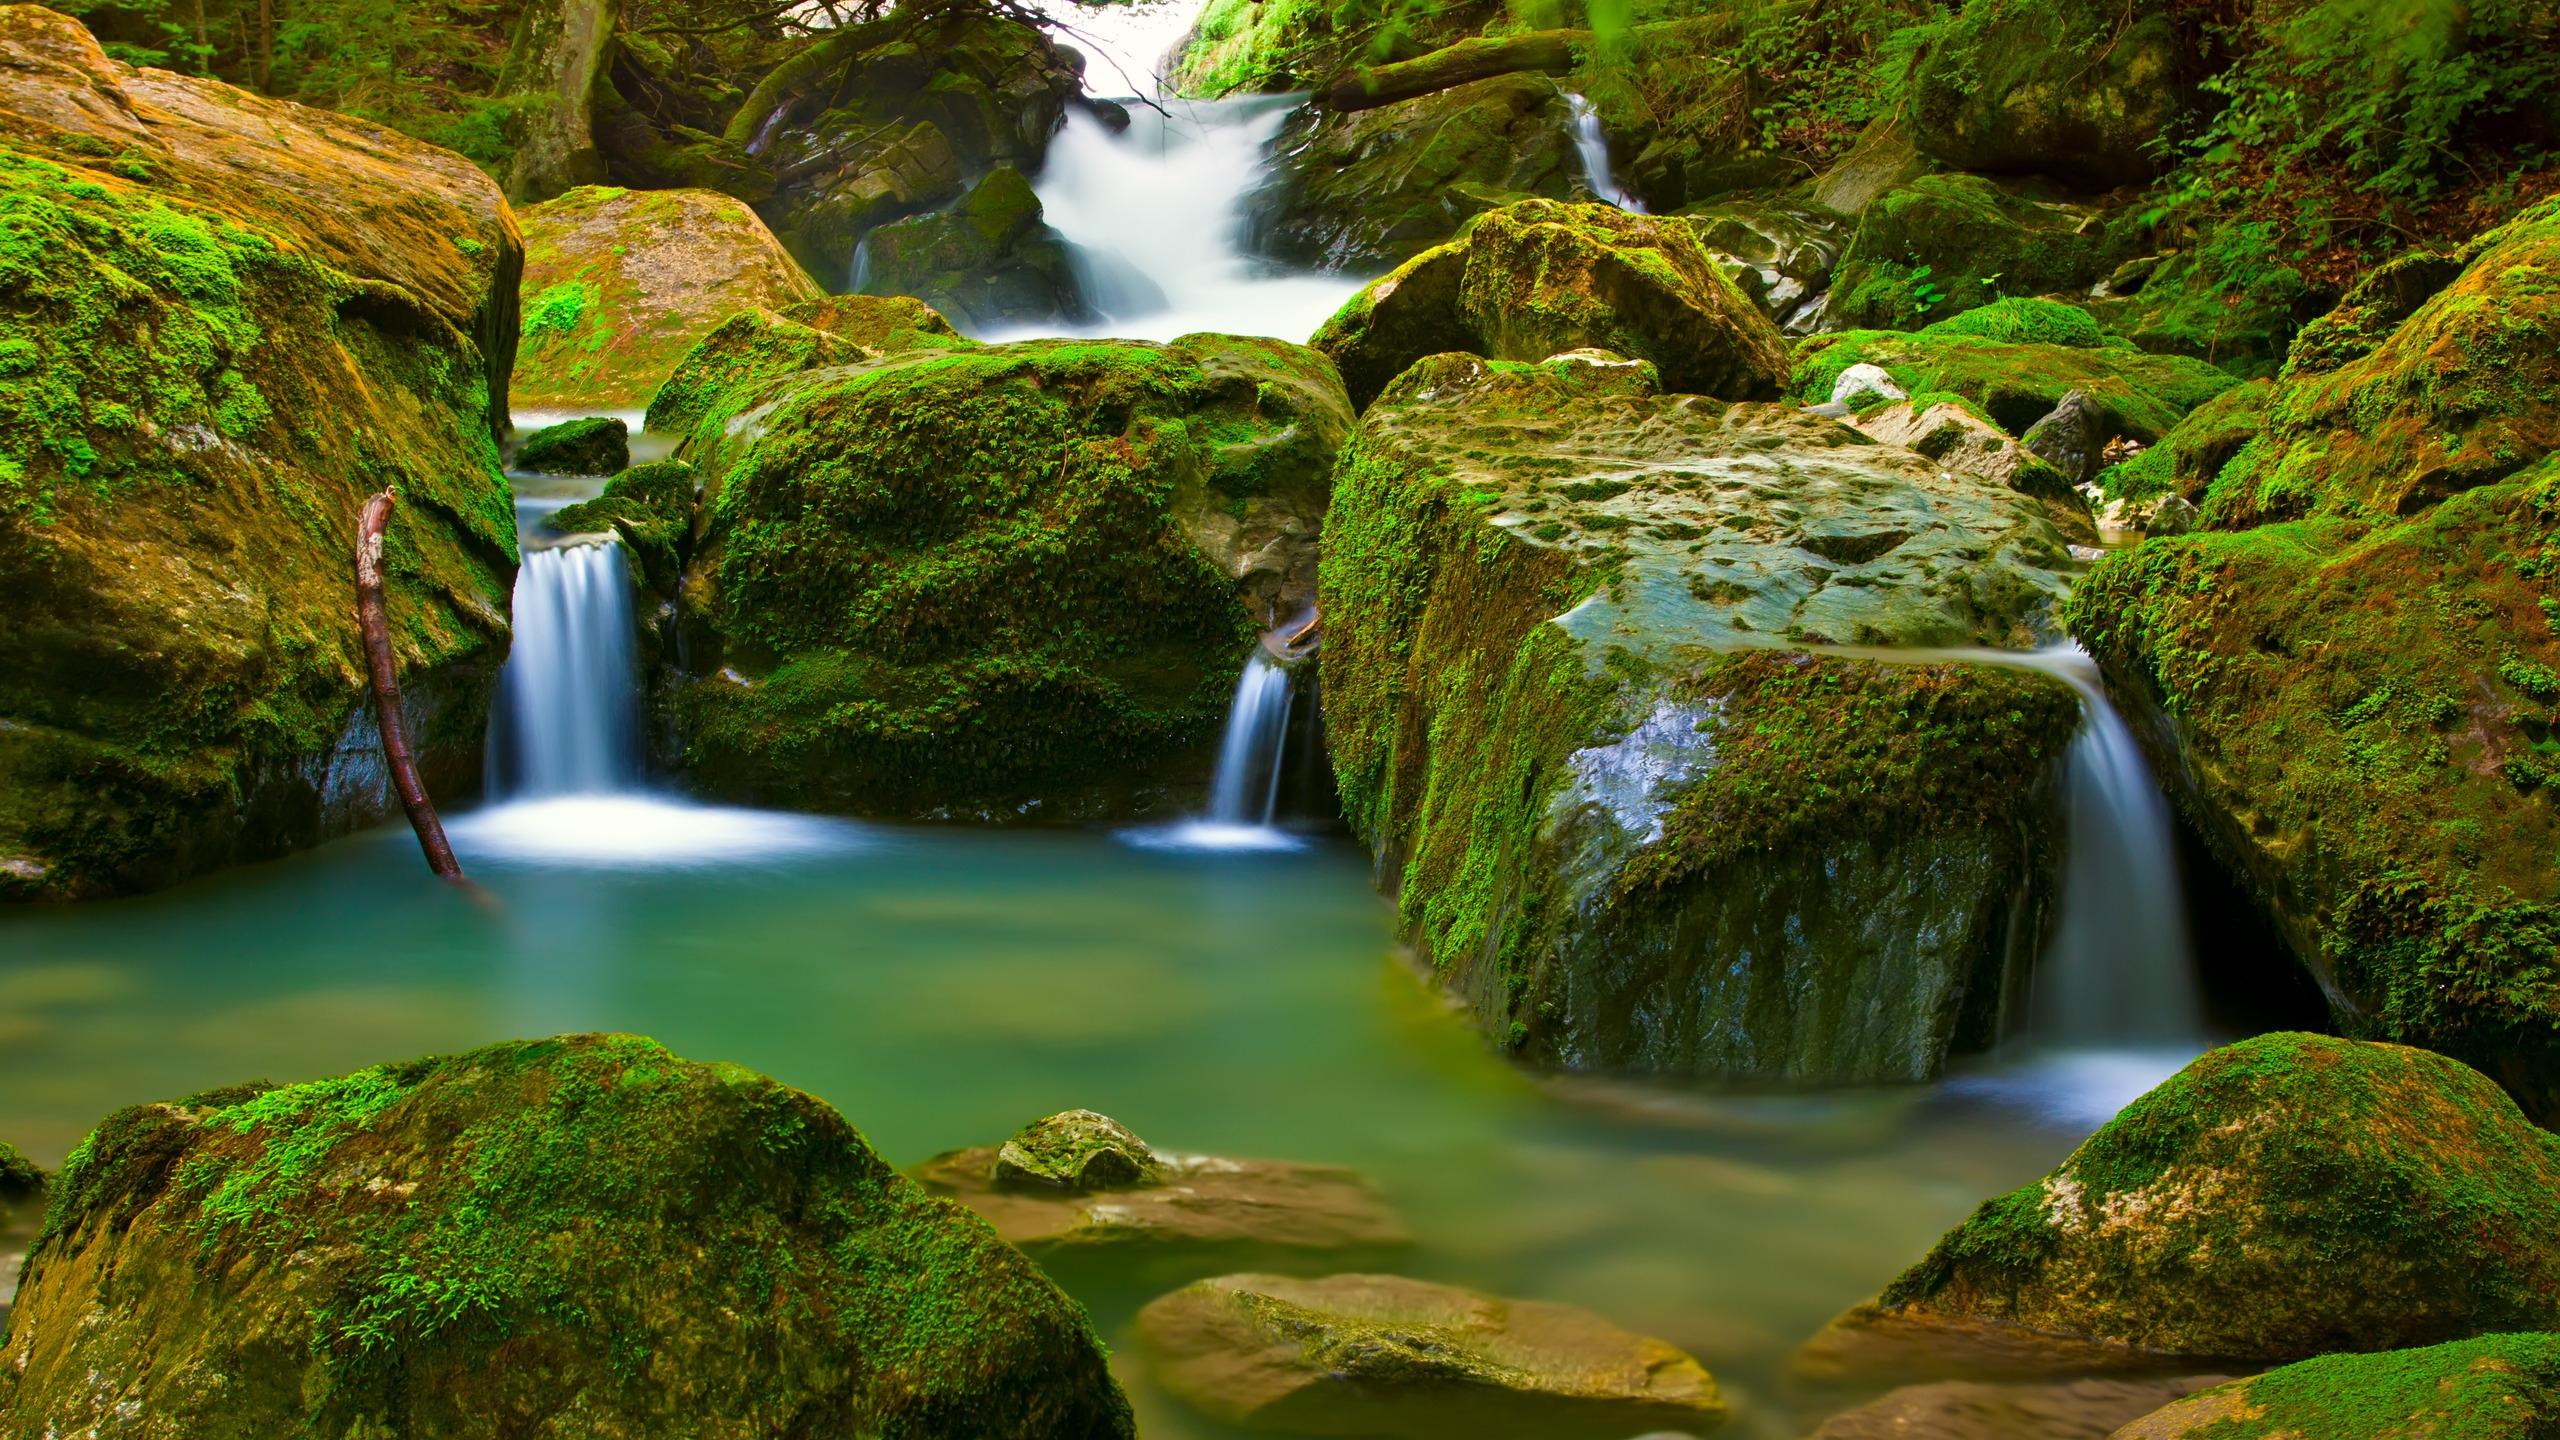 2560x1440 Waterfall desktop PC and Mac wallpaper 2560x1440